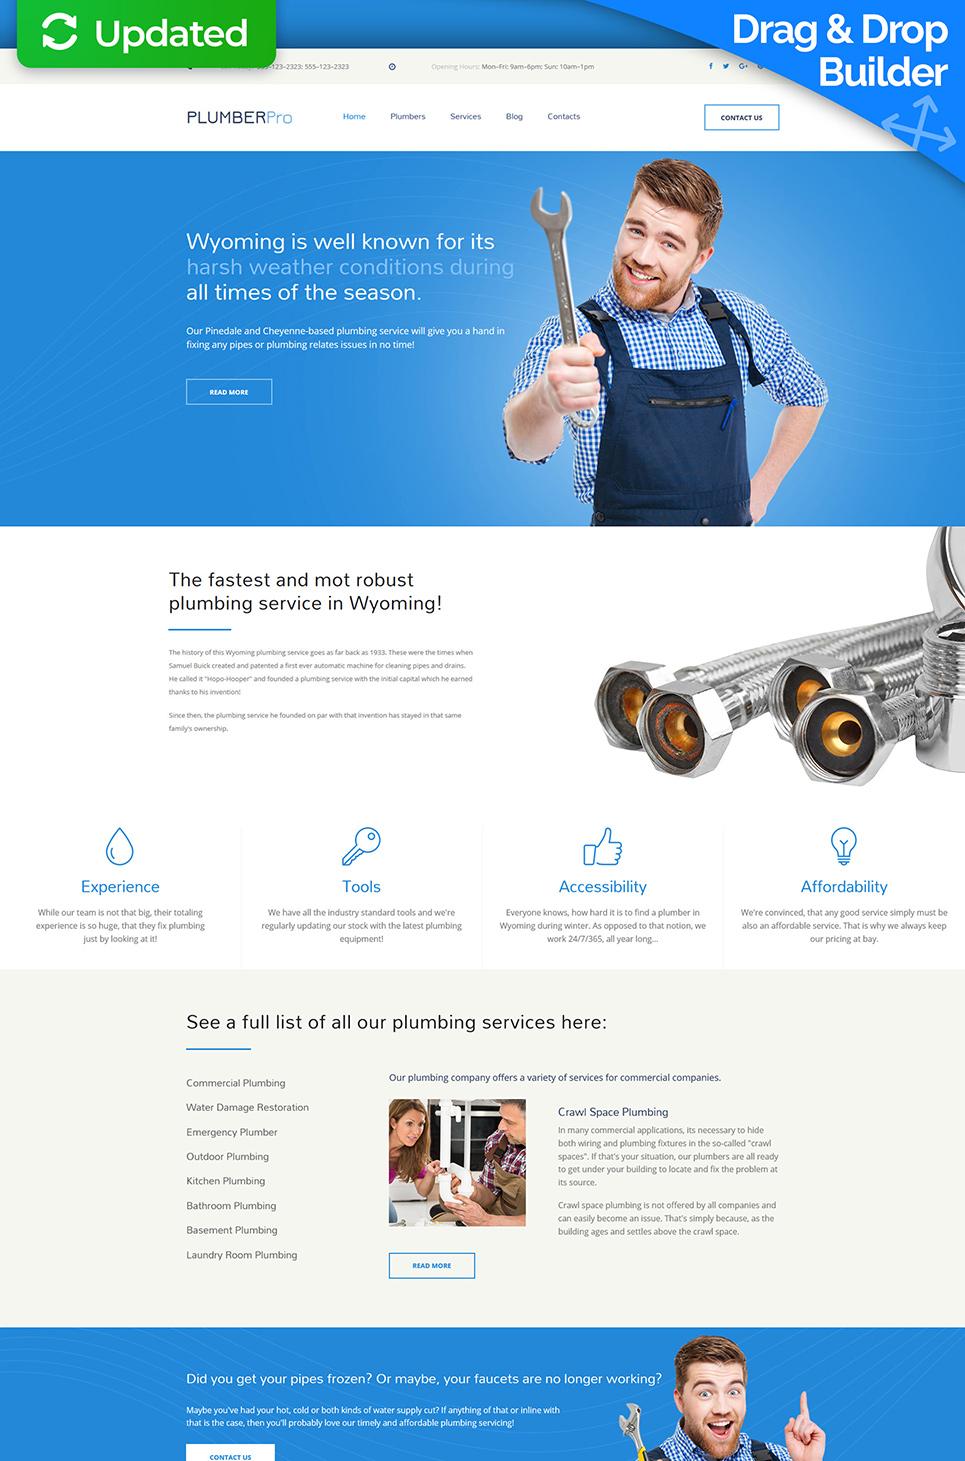 Plumber Pro Responsive Website Template - image